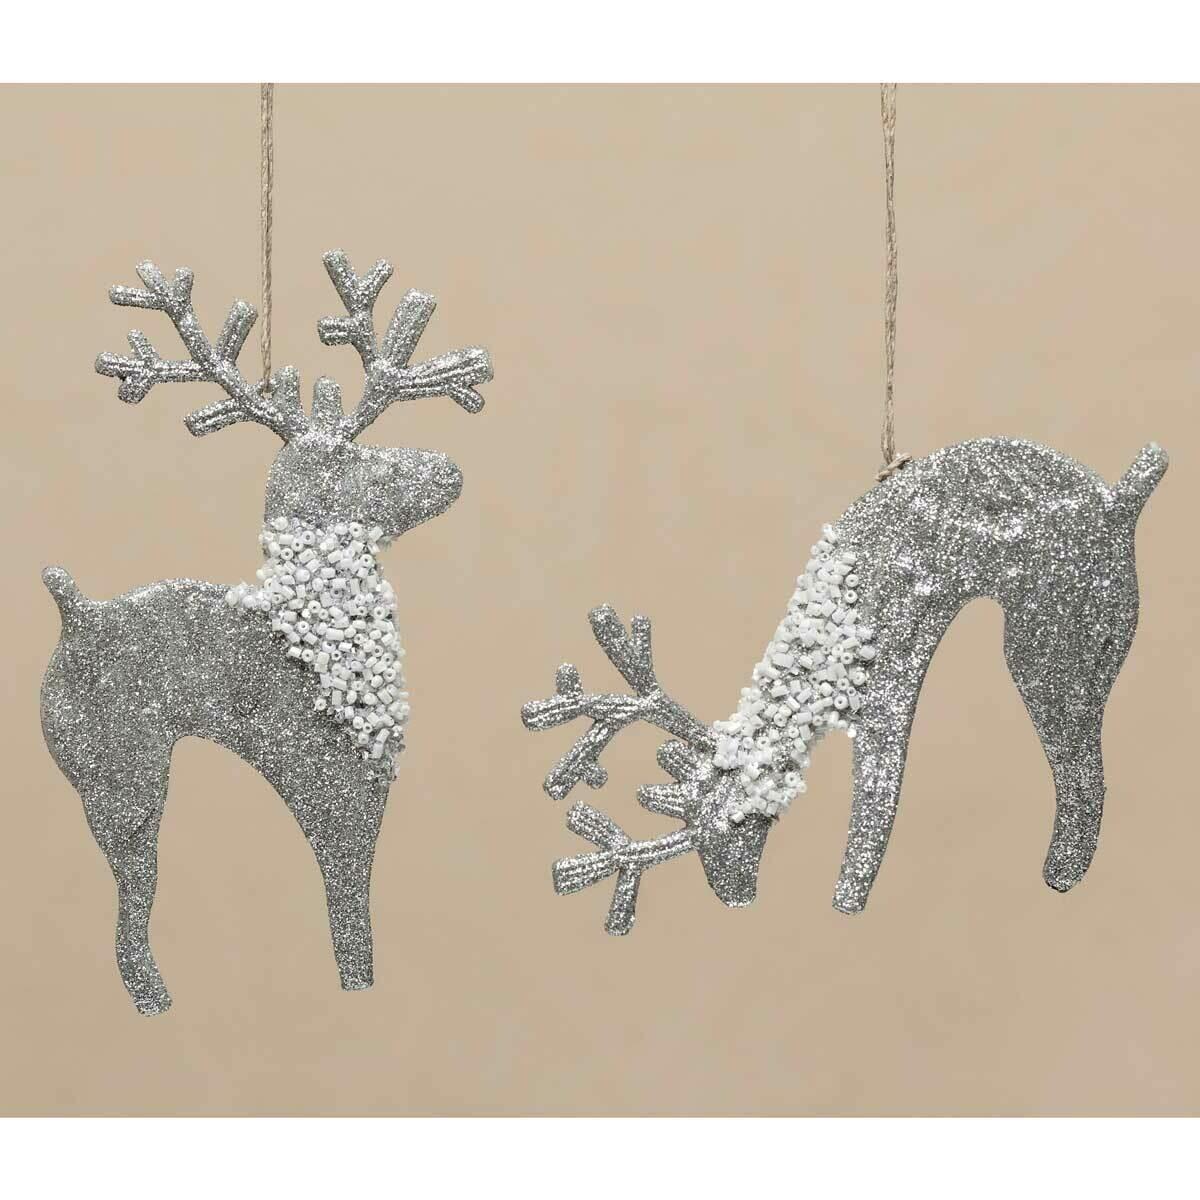 Silver Shimmery Reindeer Ornament; various